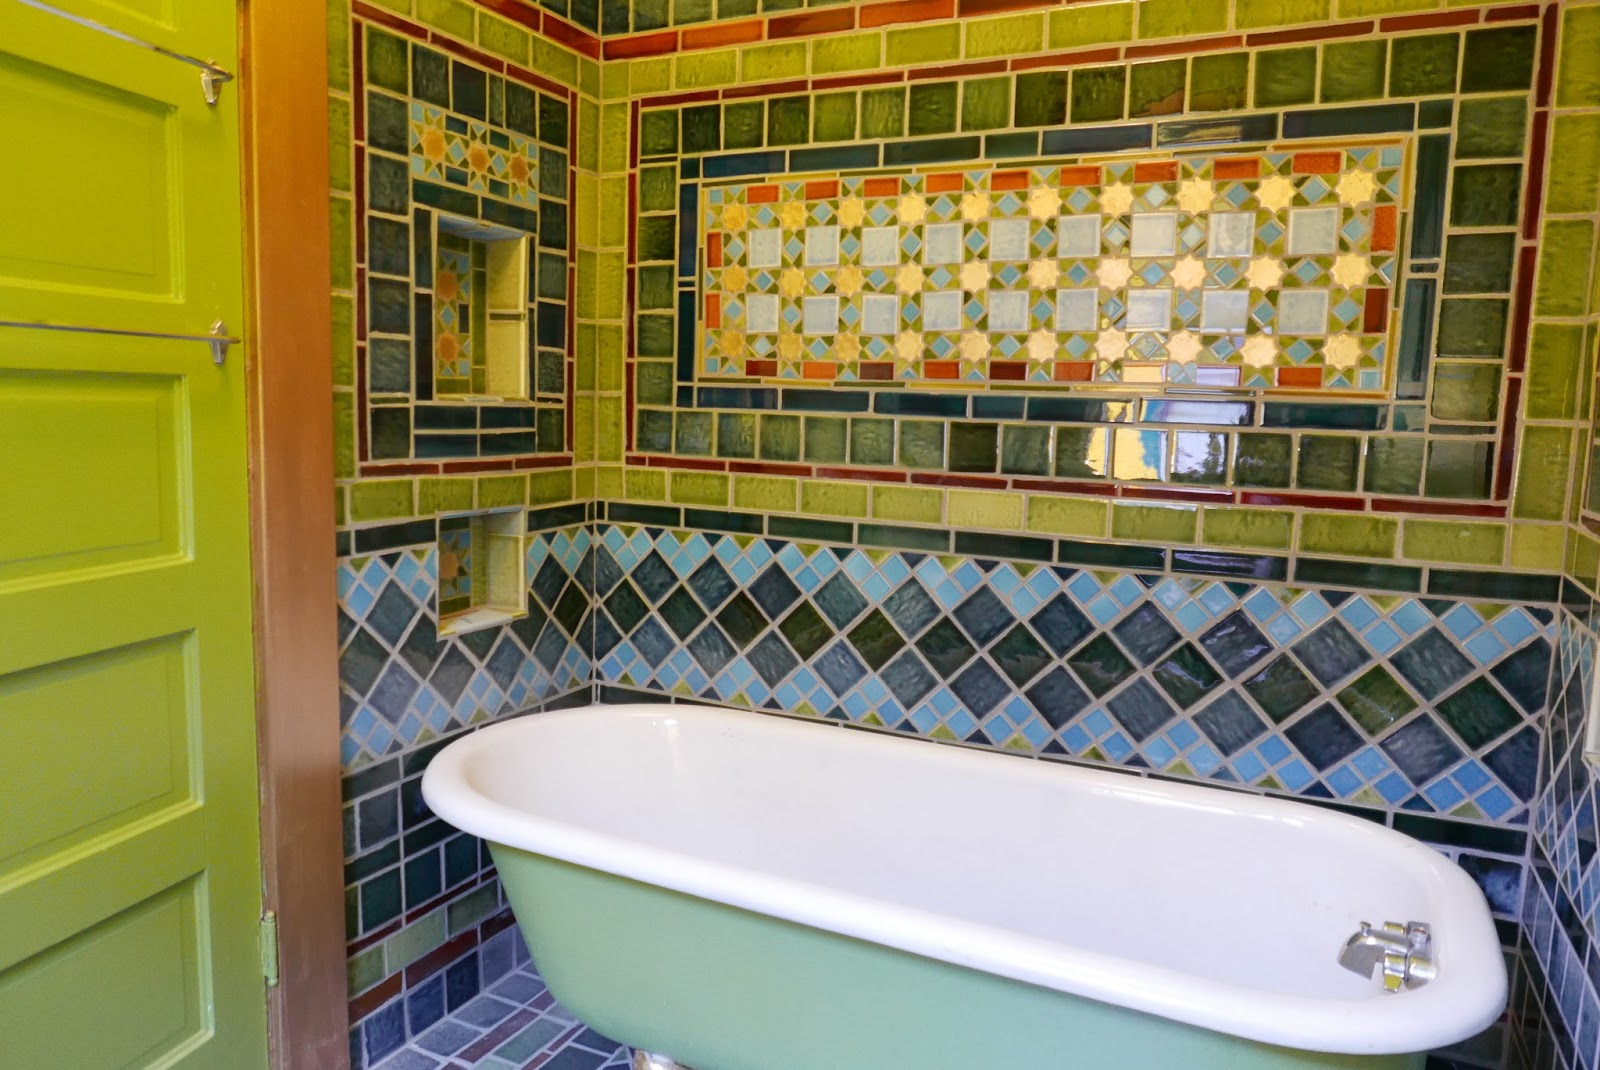 Installed bronze like tile on the weeping wall it looks old school - Tile Work In My Bathroom